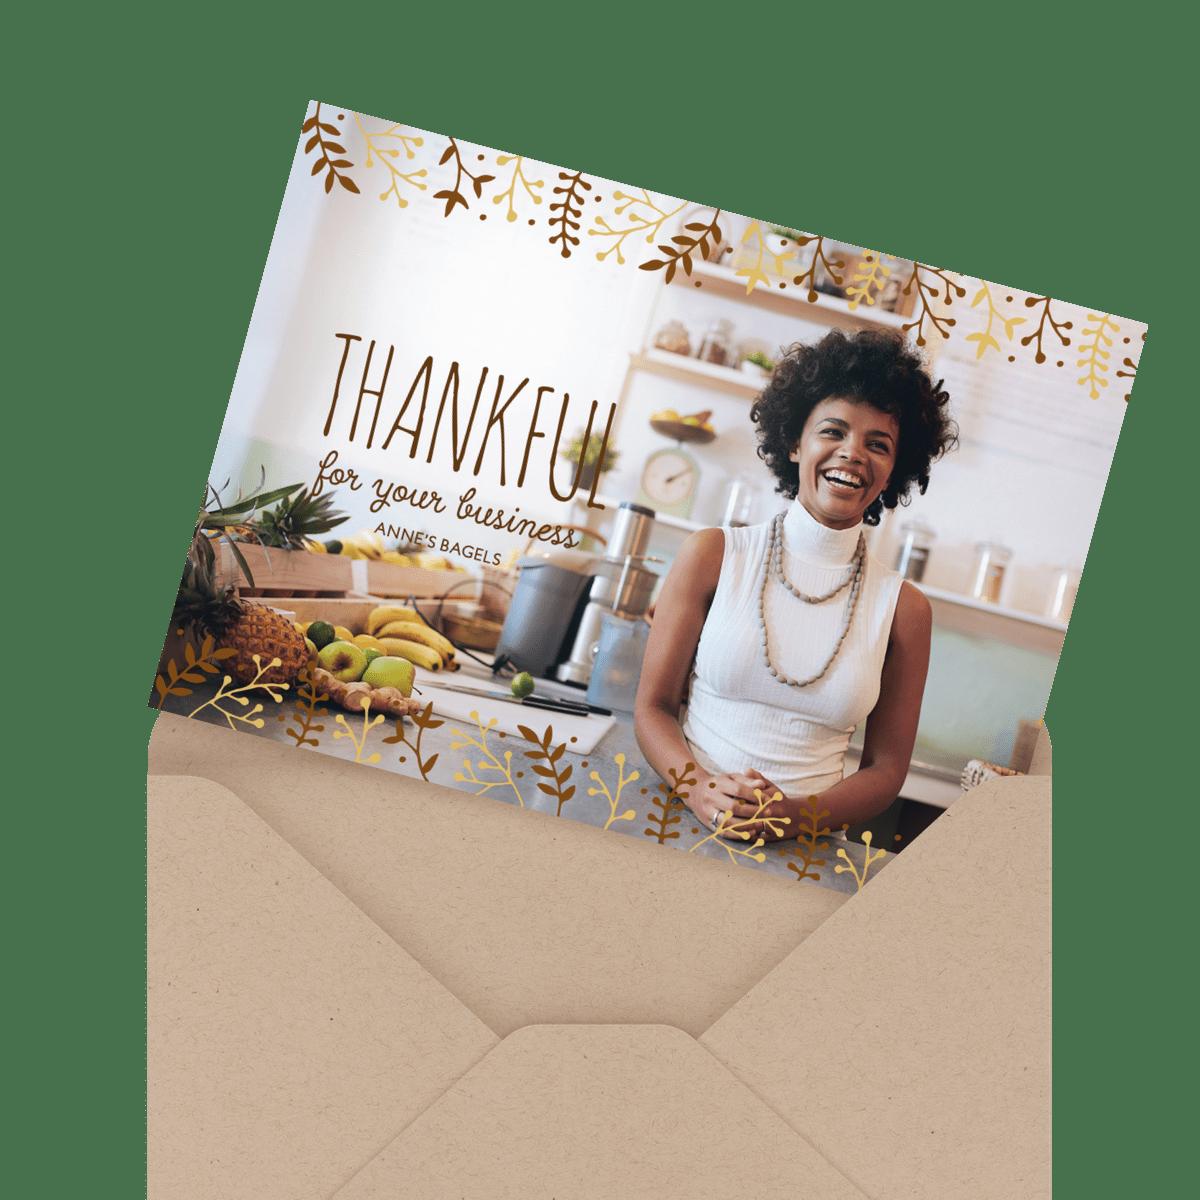 painted turkeys happy thanksgiving card in envelope